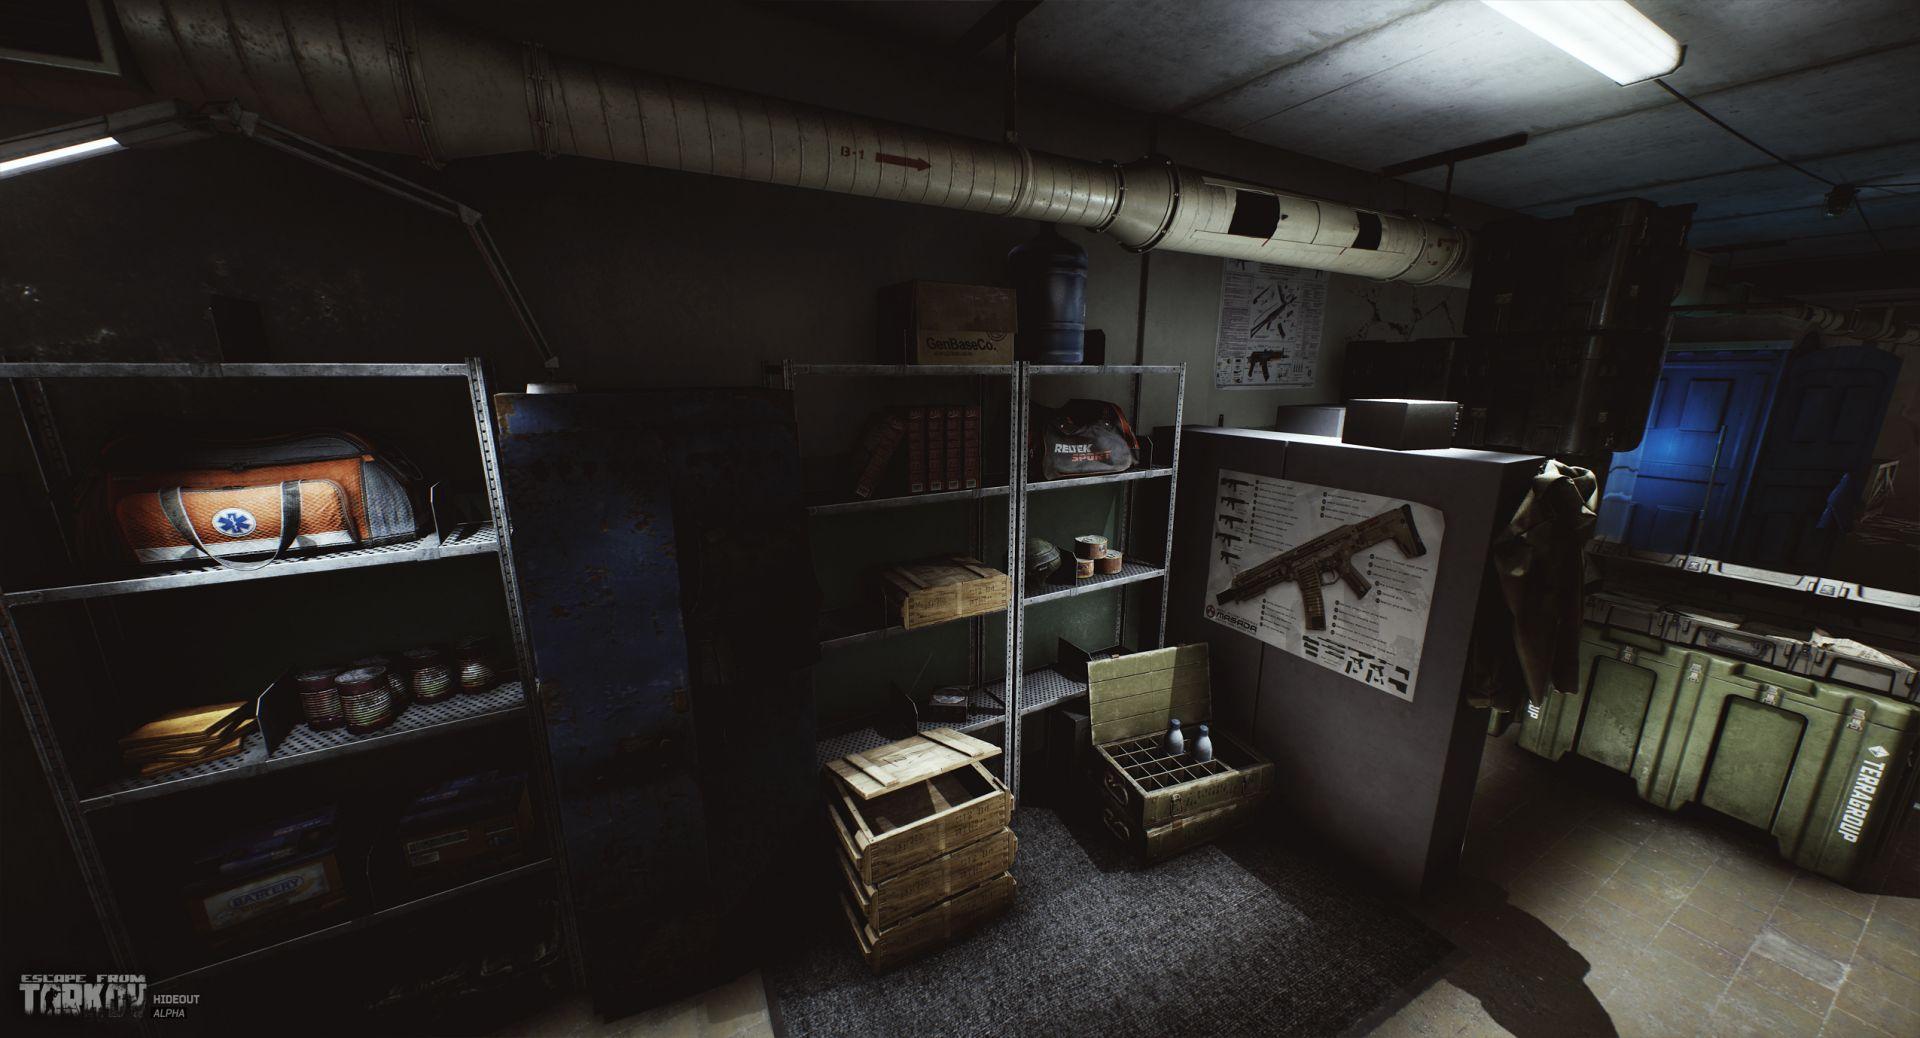 escapefromtarkov_hideout16